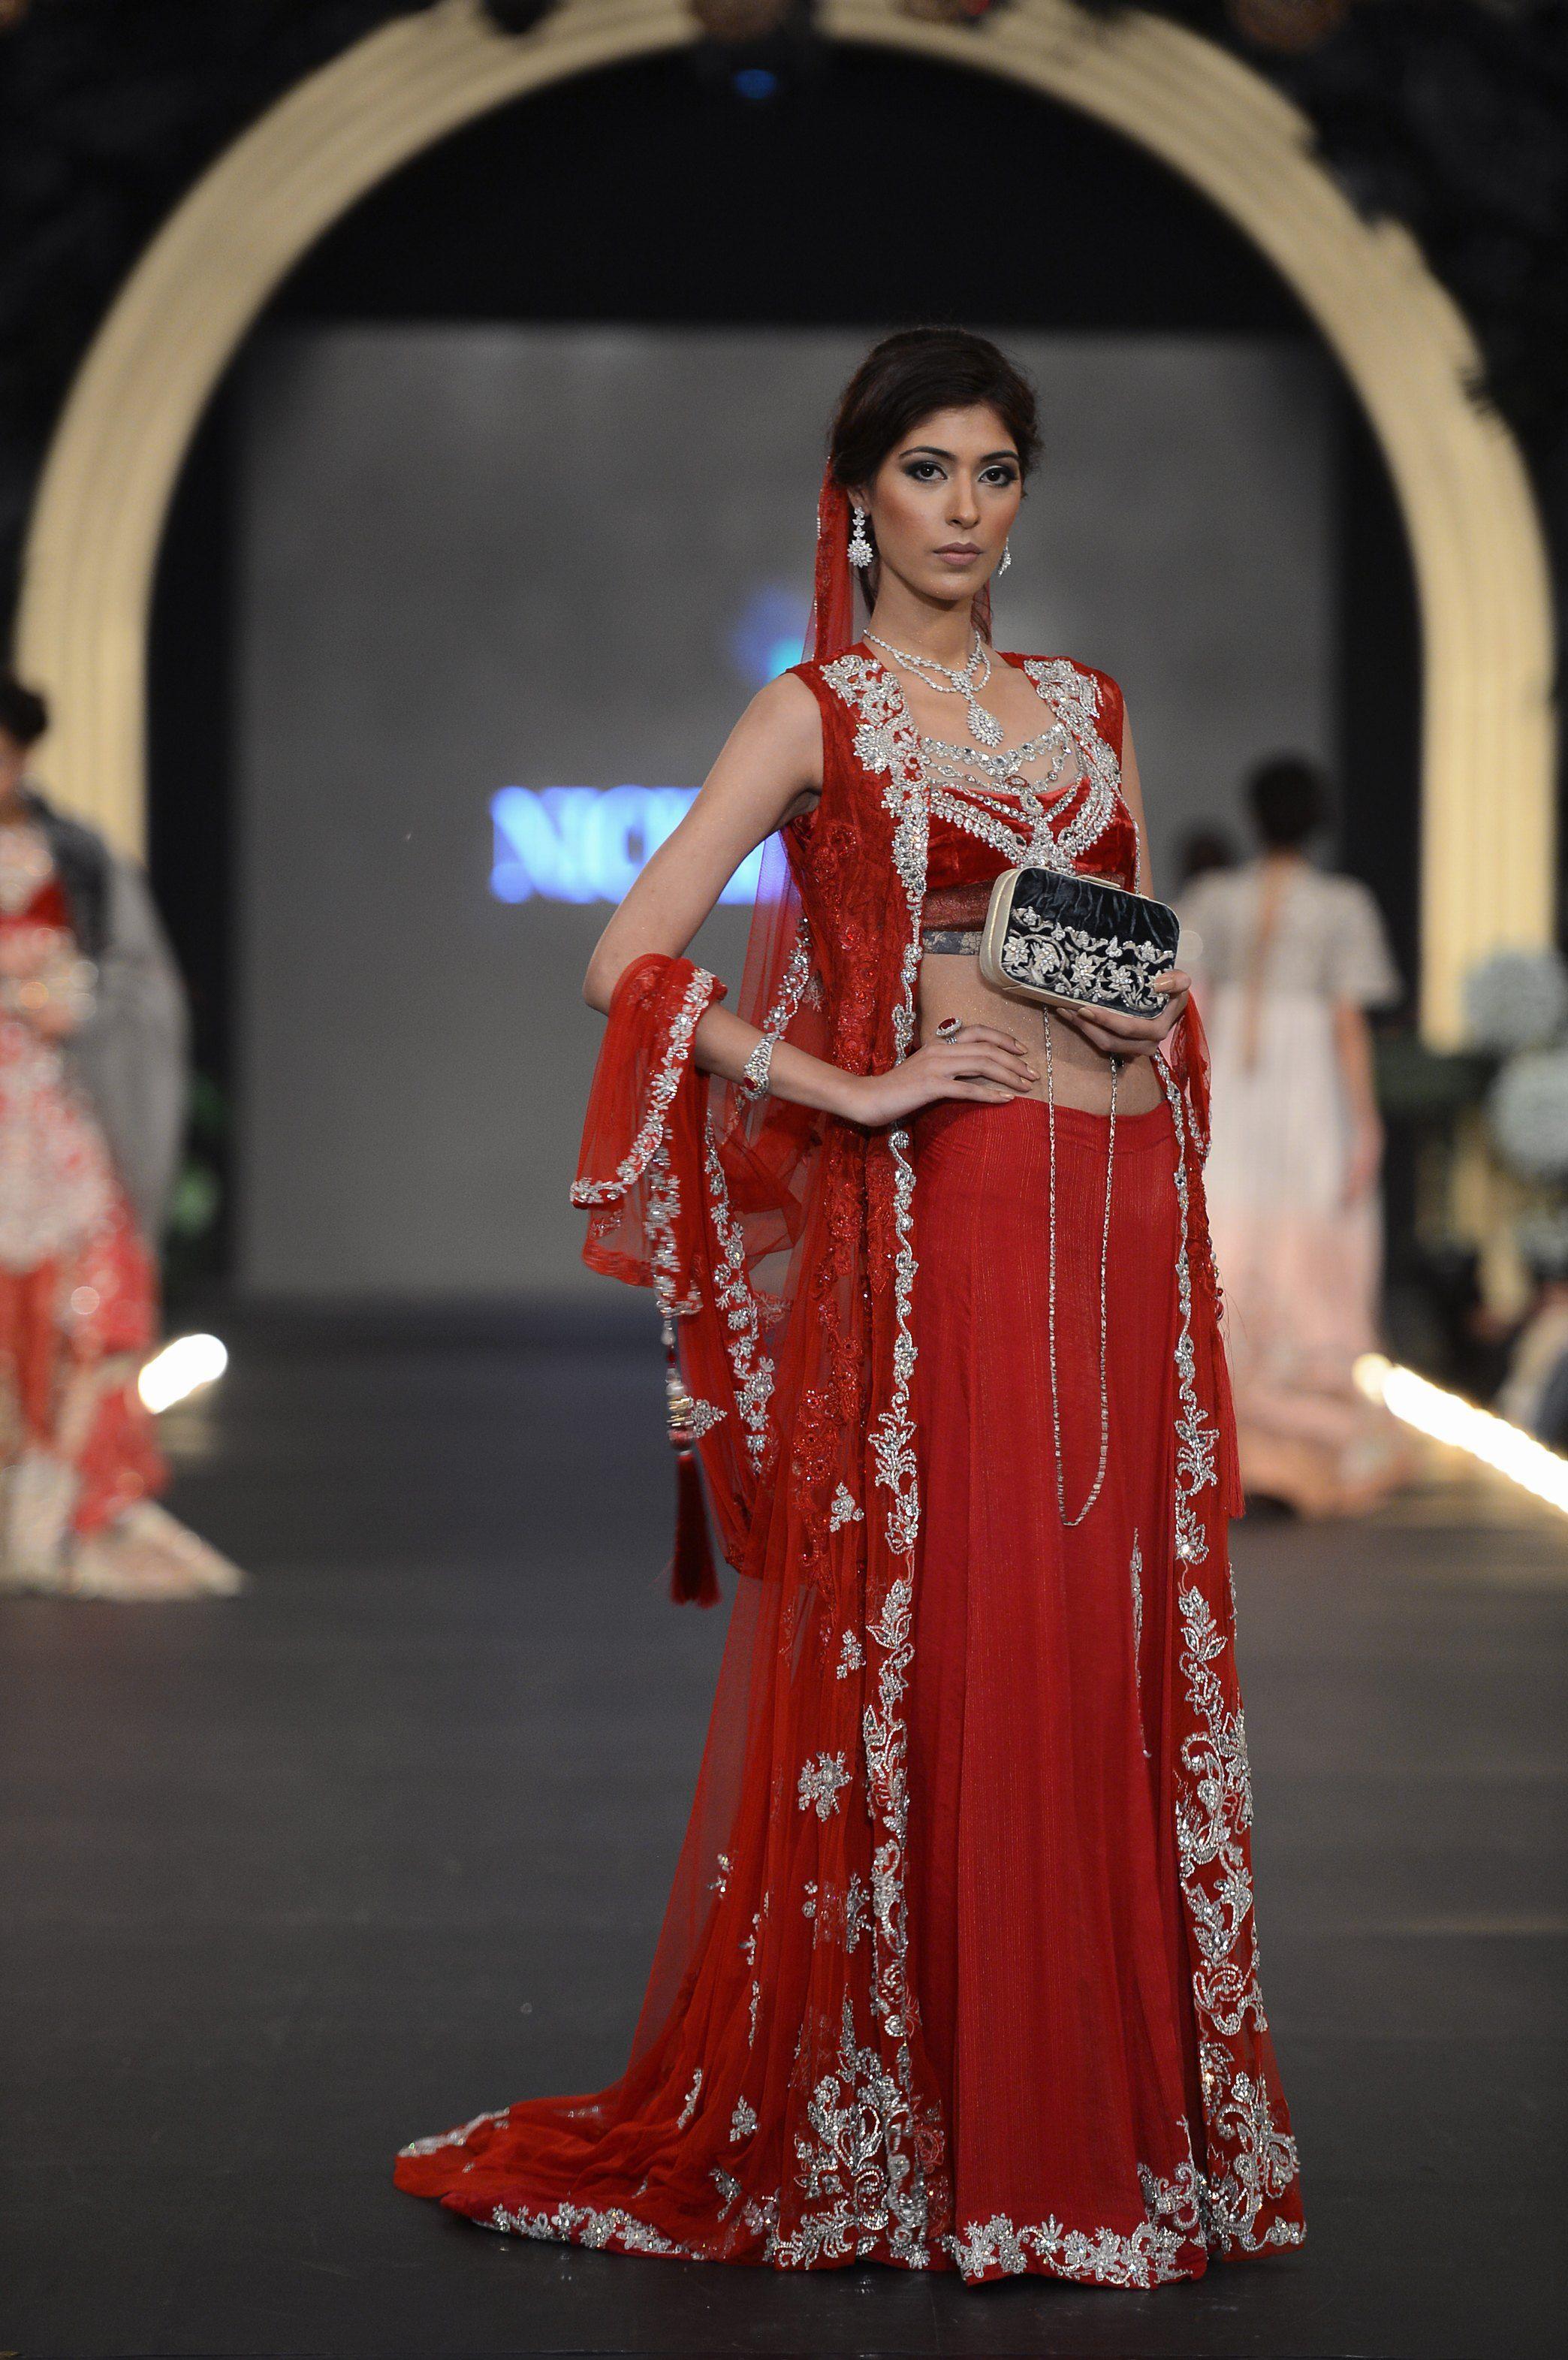 Nickienina Dresses Dress Partydresses Http Www Fashioncentral Pk Pakistani Designers 22 Nickie Nina Pakistan Fashion Fashion Pakistani Formal Dresses